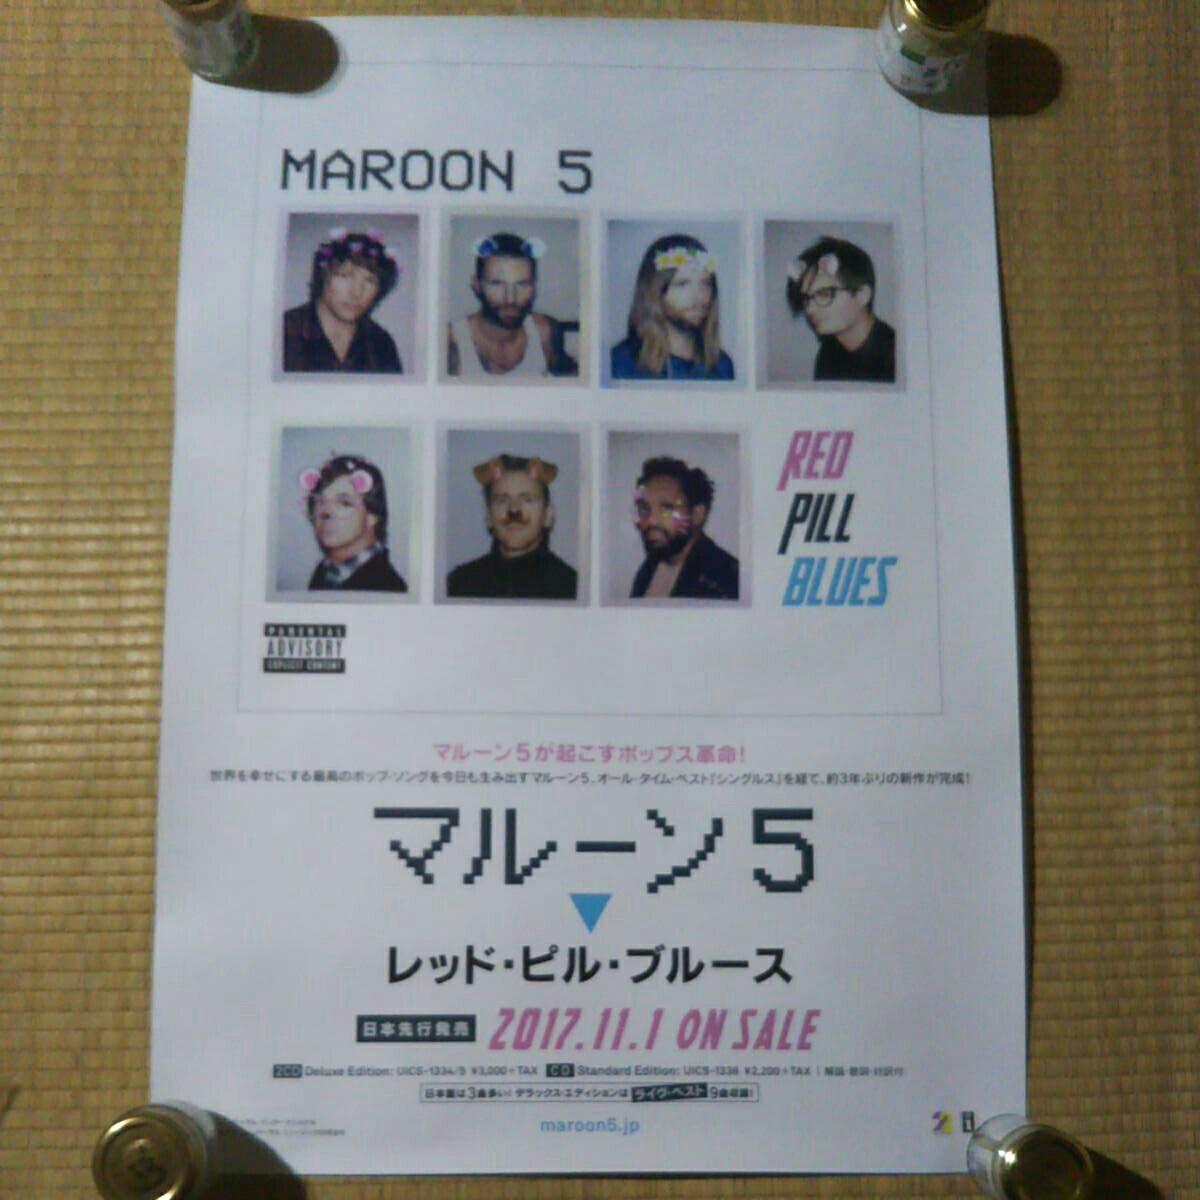 MAROON5/マルーン5 レッドピルブルース ポスター